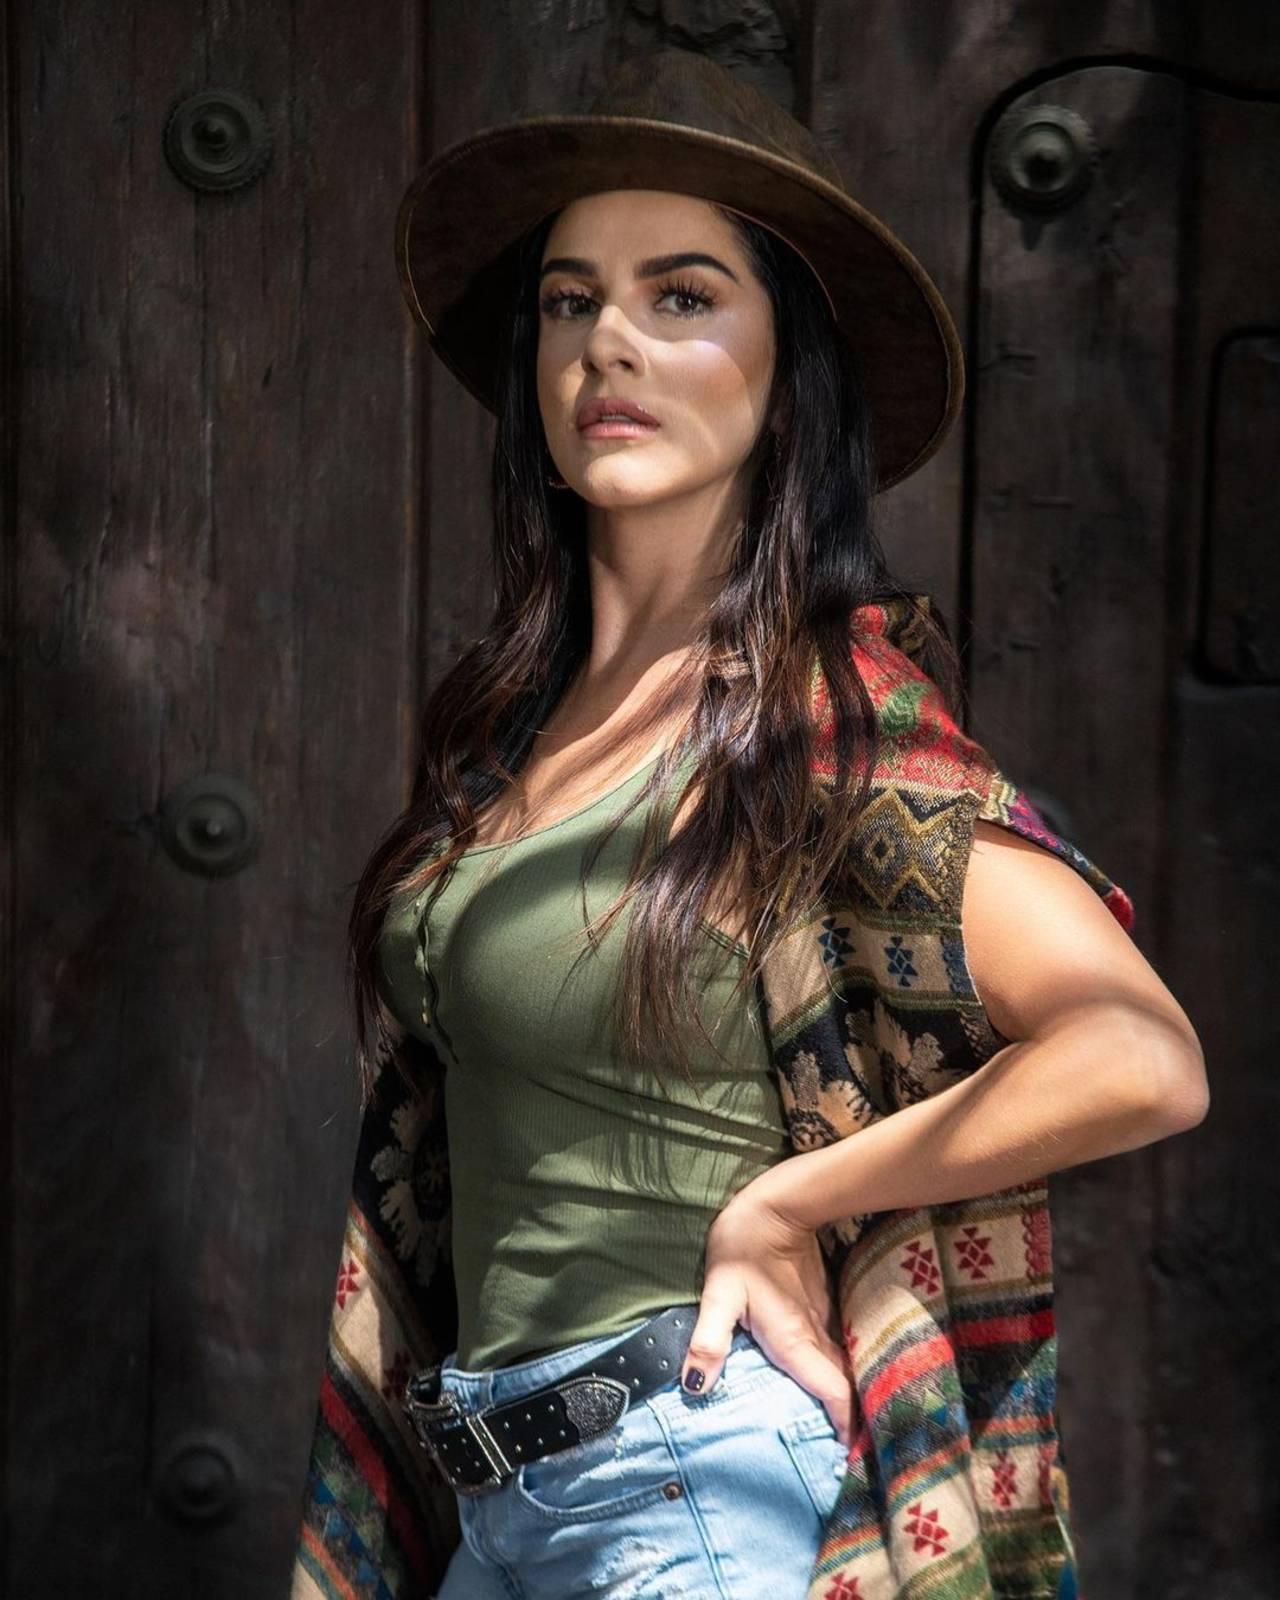 Lidia Ávila no soporta que M'Balia sea lesbiana y cancela gira de ov7